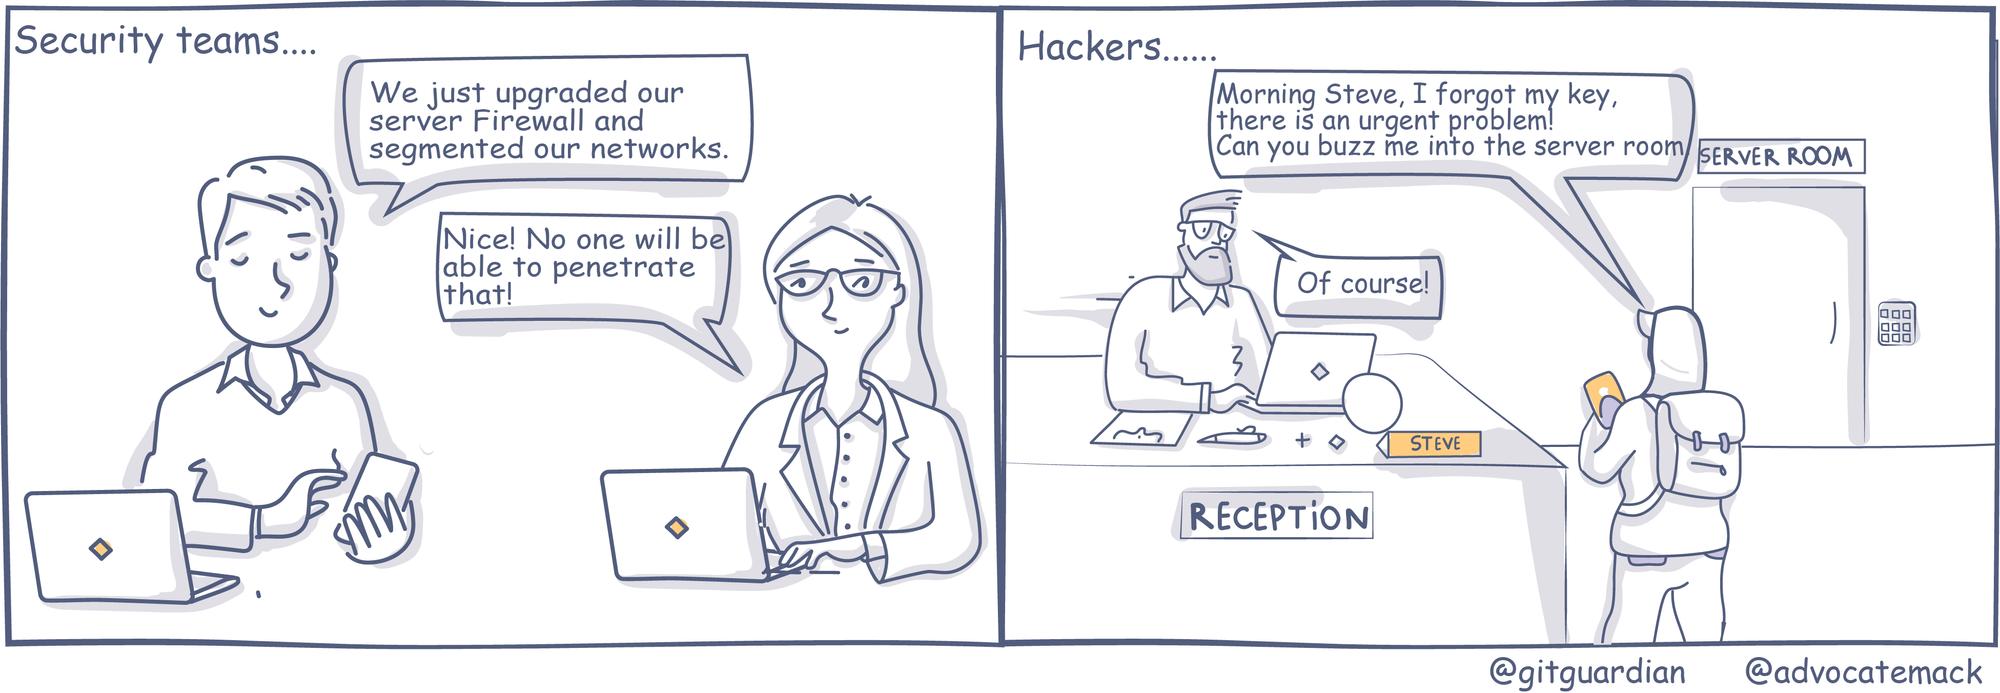 Physical hacking